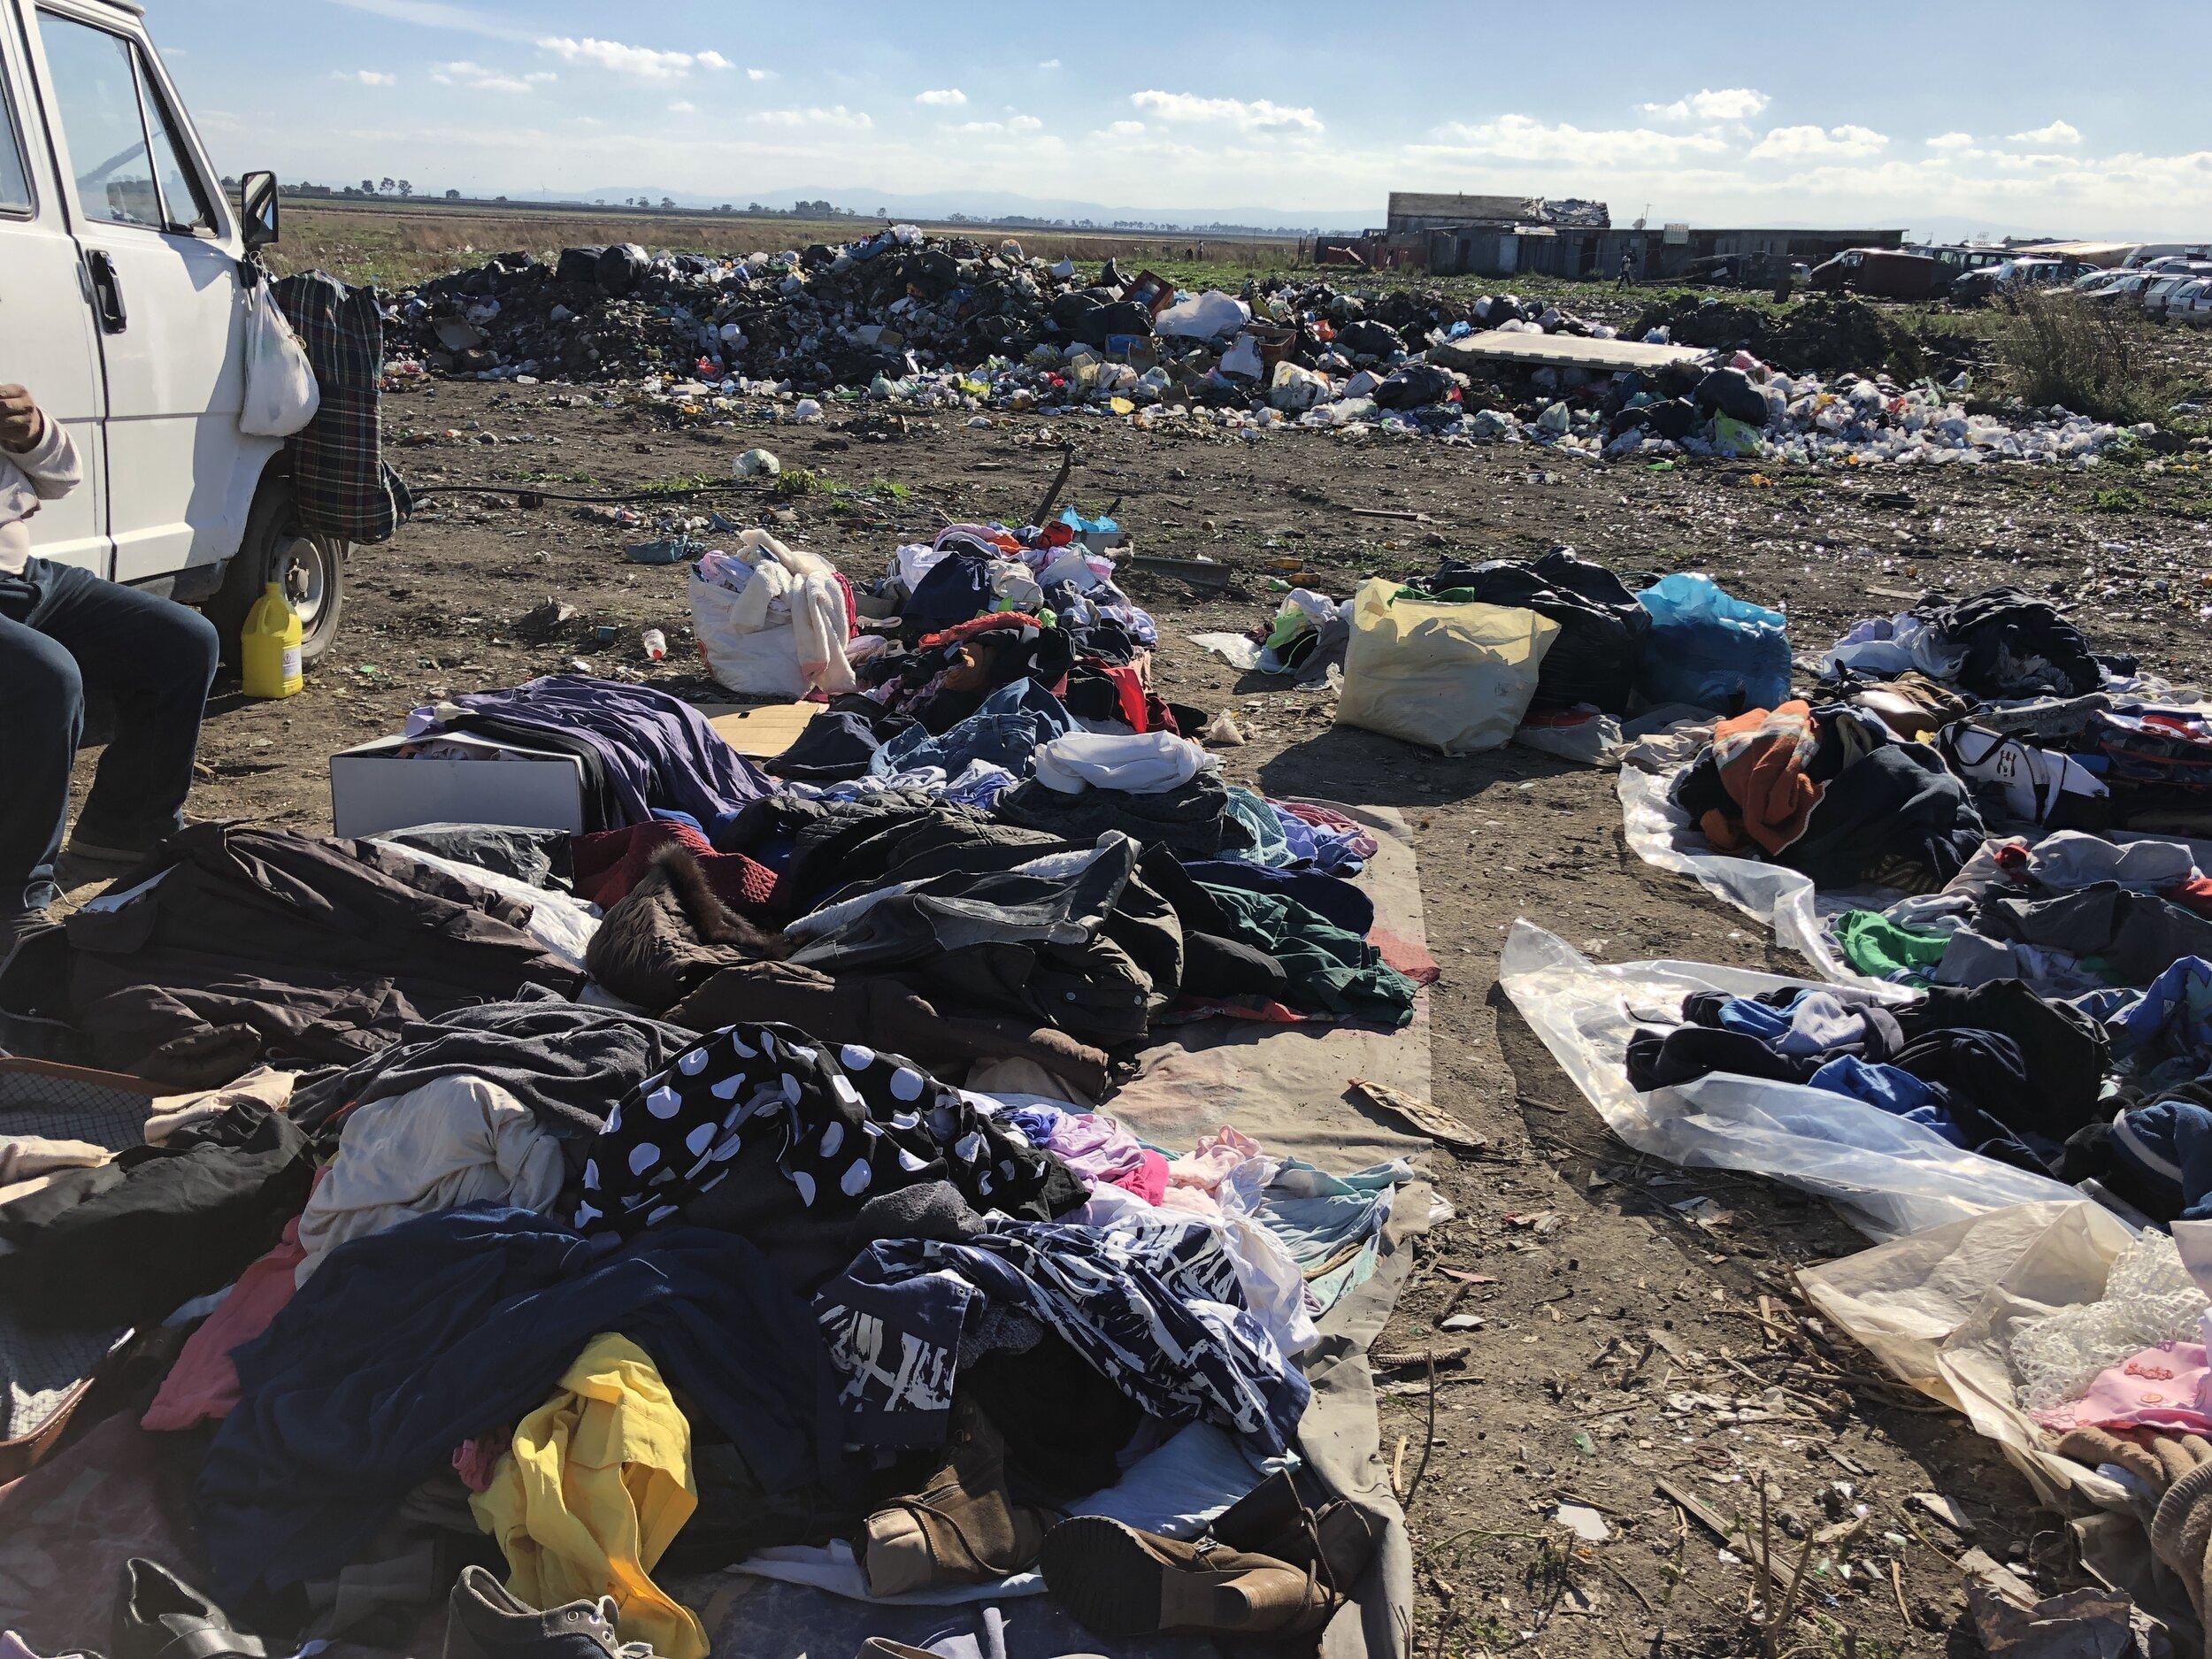 Vendor tarps and trash heaps at Gran Ghetto. Foggia, Italy. 8 October 2019. ©Pamela Kerpius